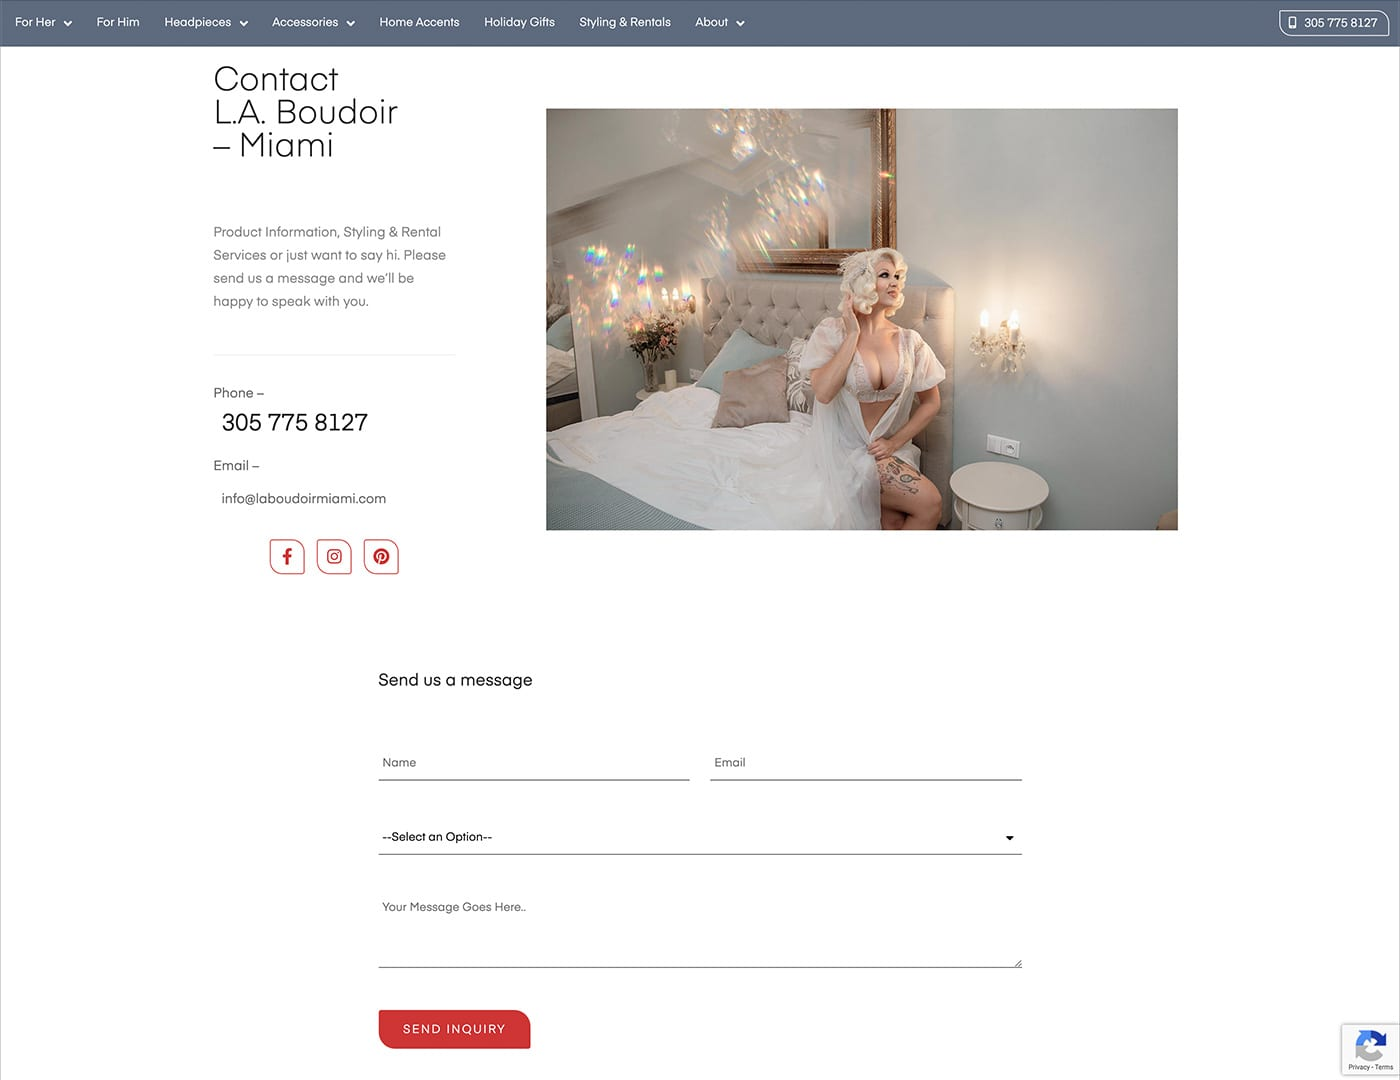 Form Builder with Google ReCaptcha v3 - laboudoirmiami.com - Online Store Built with bizProWeb | Miami